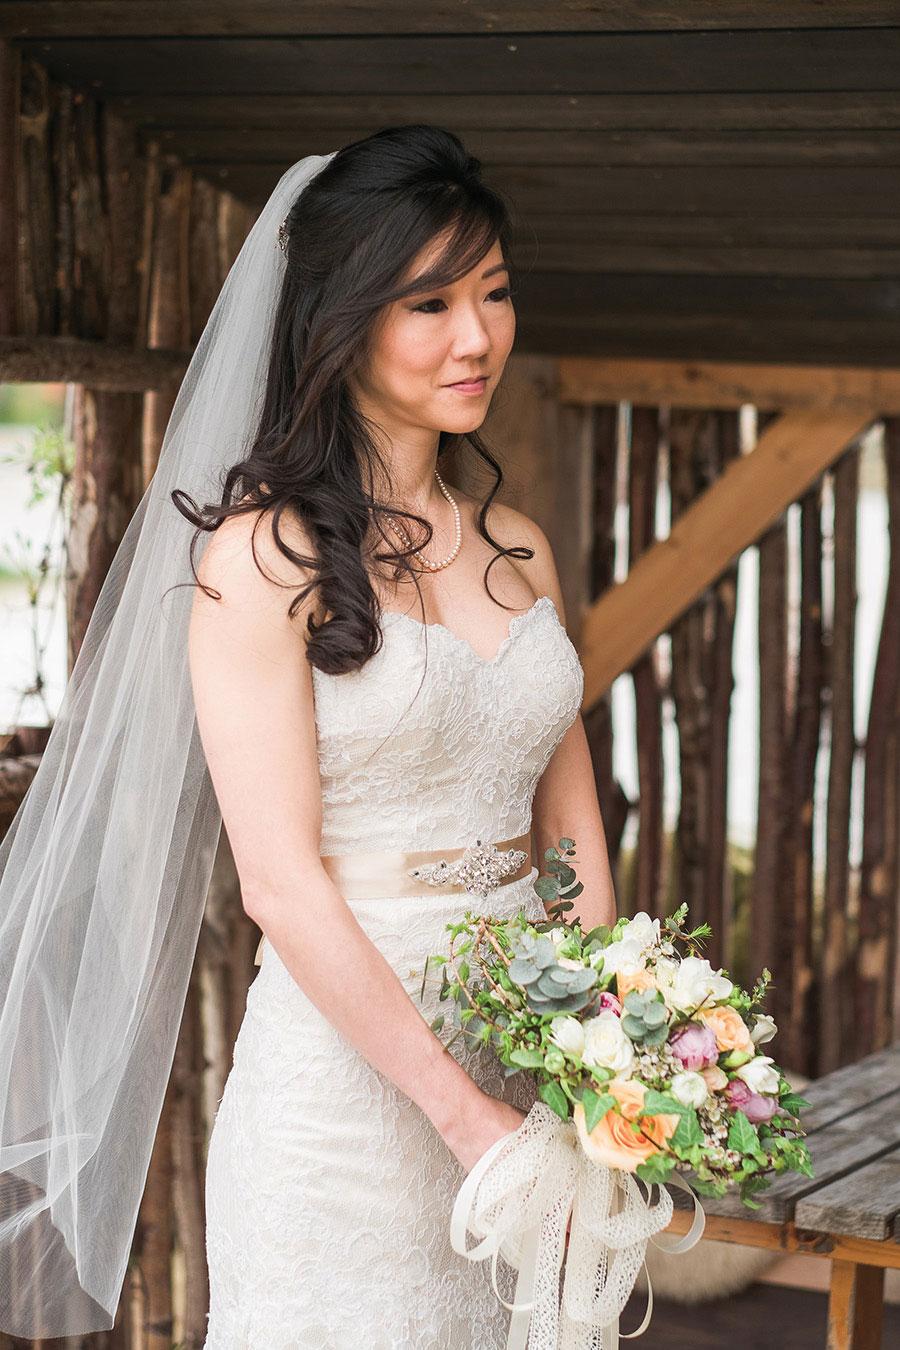 breathtaking-scenic-wedding-in-norway20160914_0108